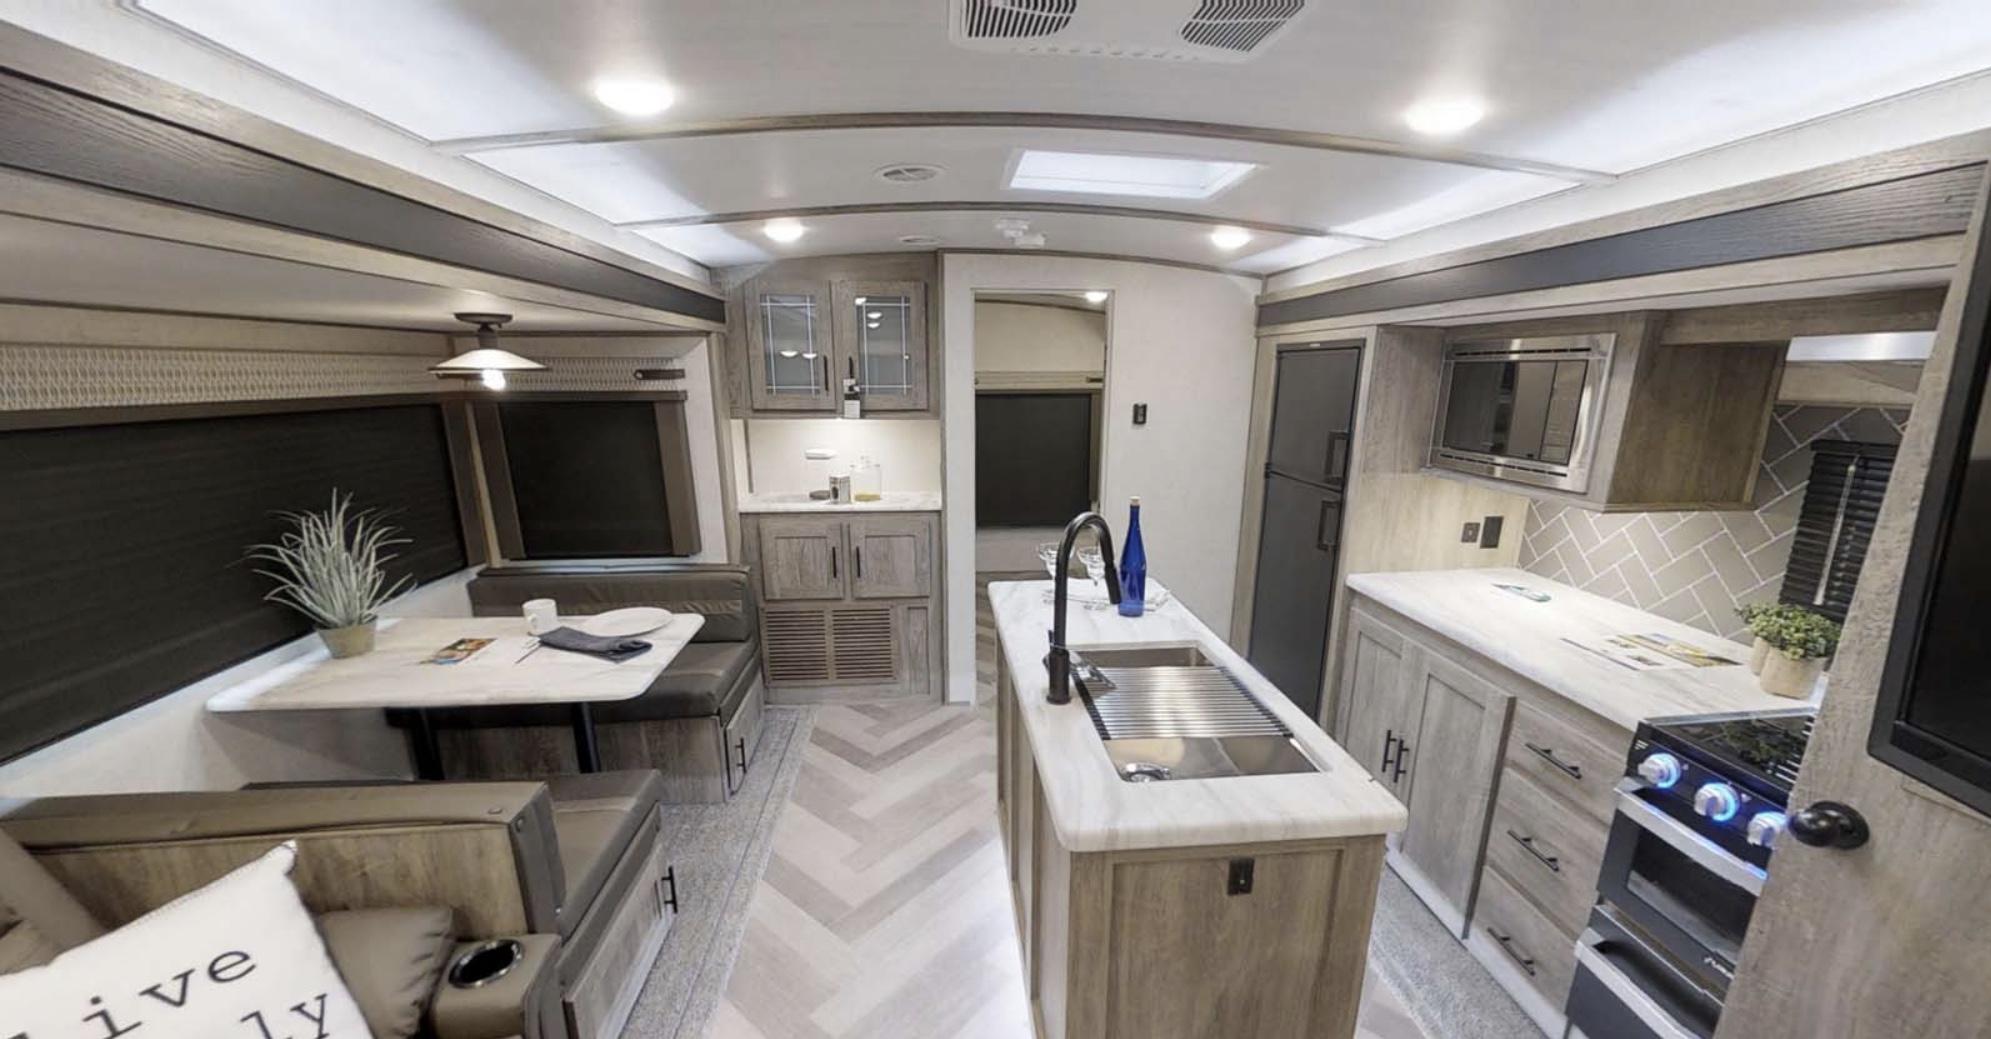 Huge kitchen with island. Forest River Salem Hemisphere 2020